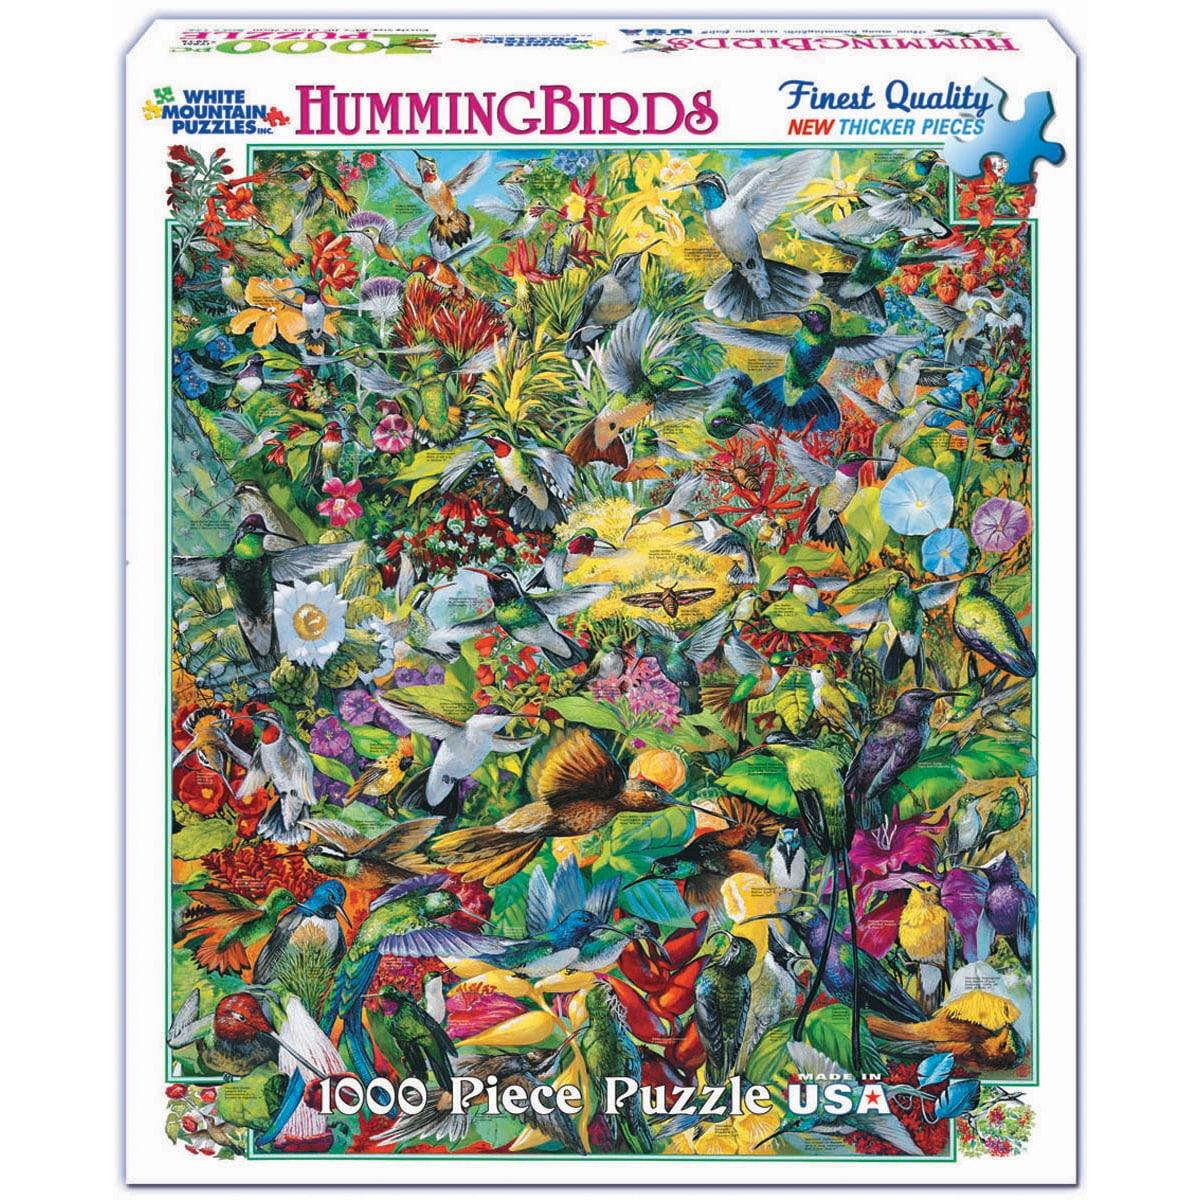 White Mountain Puzzles Hummingbirds 1000-piece Jigsaw Puz...